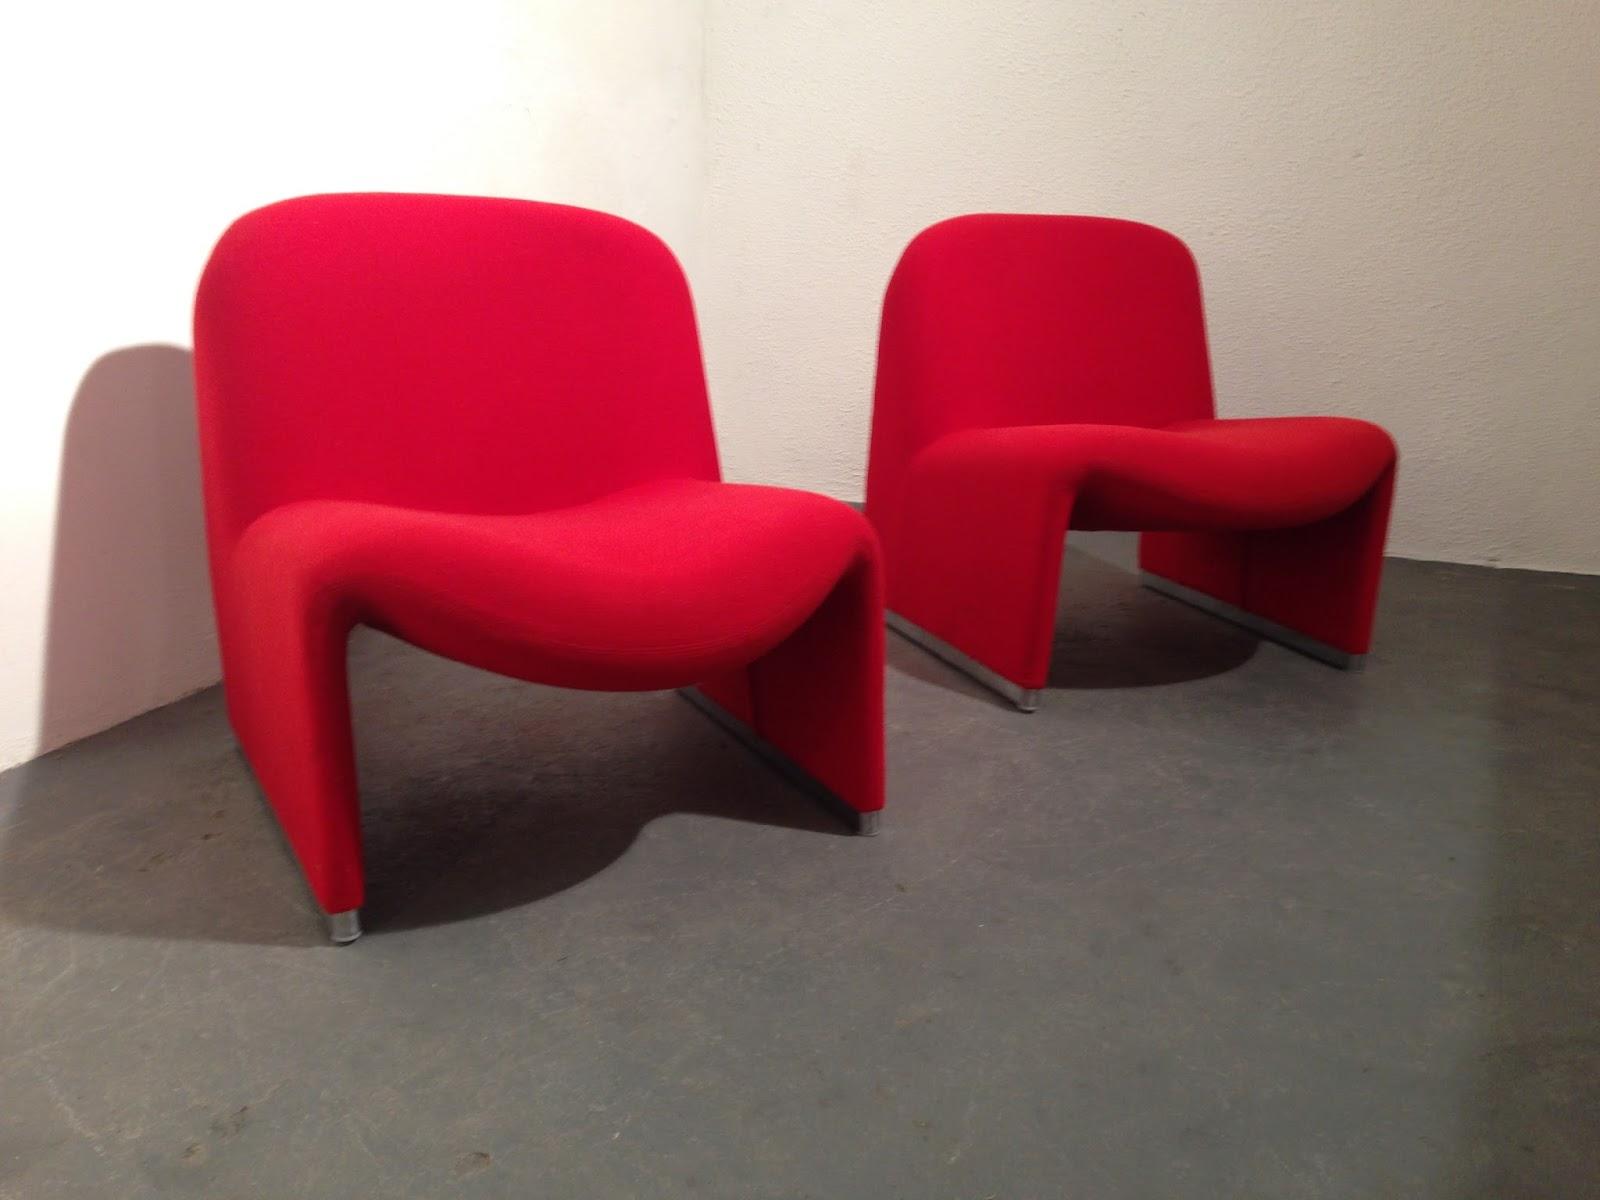 retro dining chairs ireland desk chair edmonton ocd vintage furniture